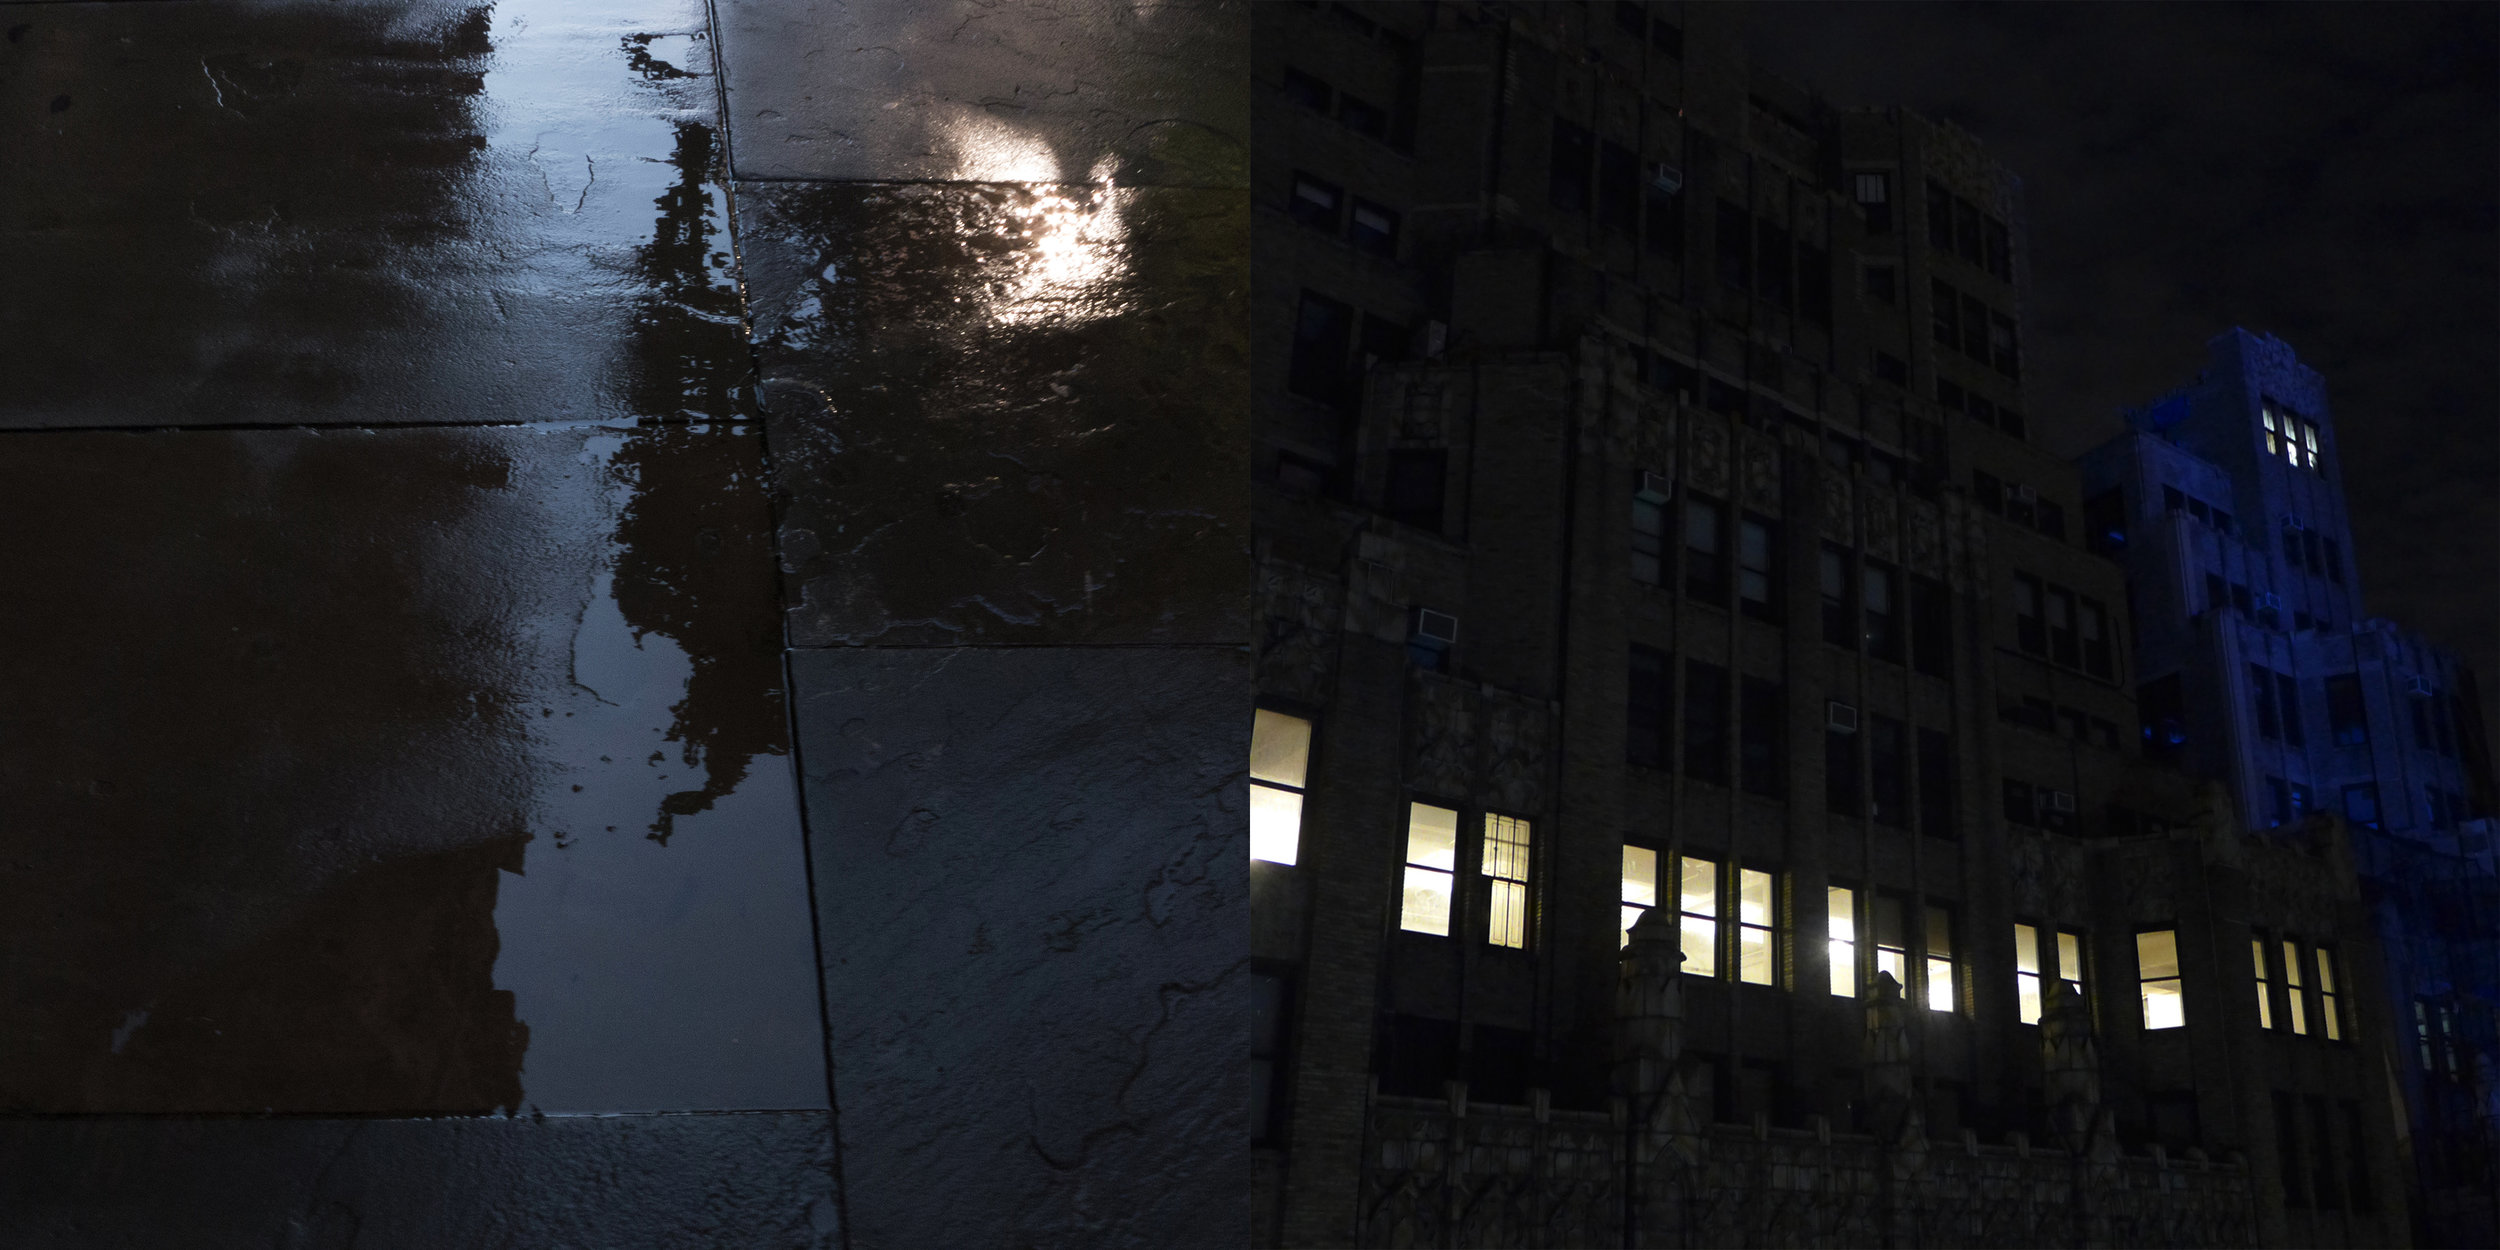 Water on Slate, Gramercy Park & Night, West 29th Street